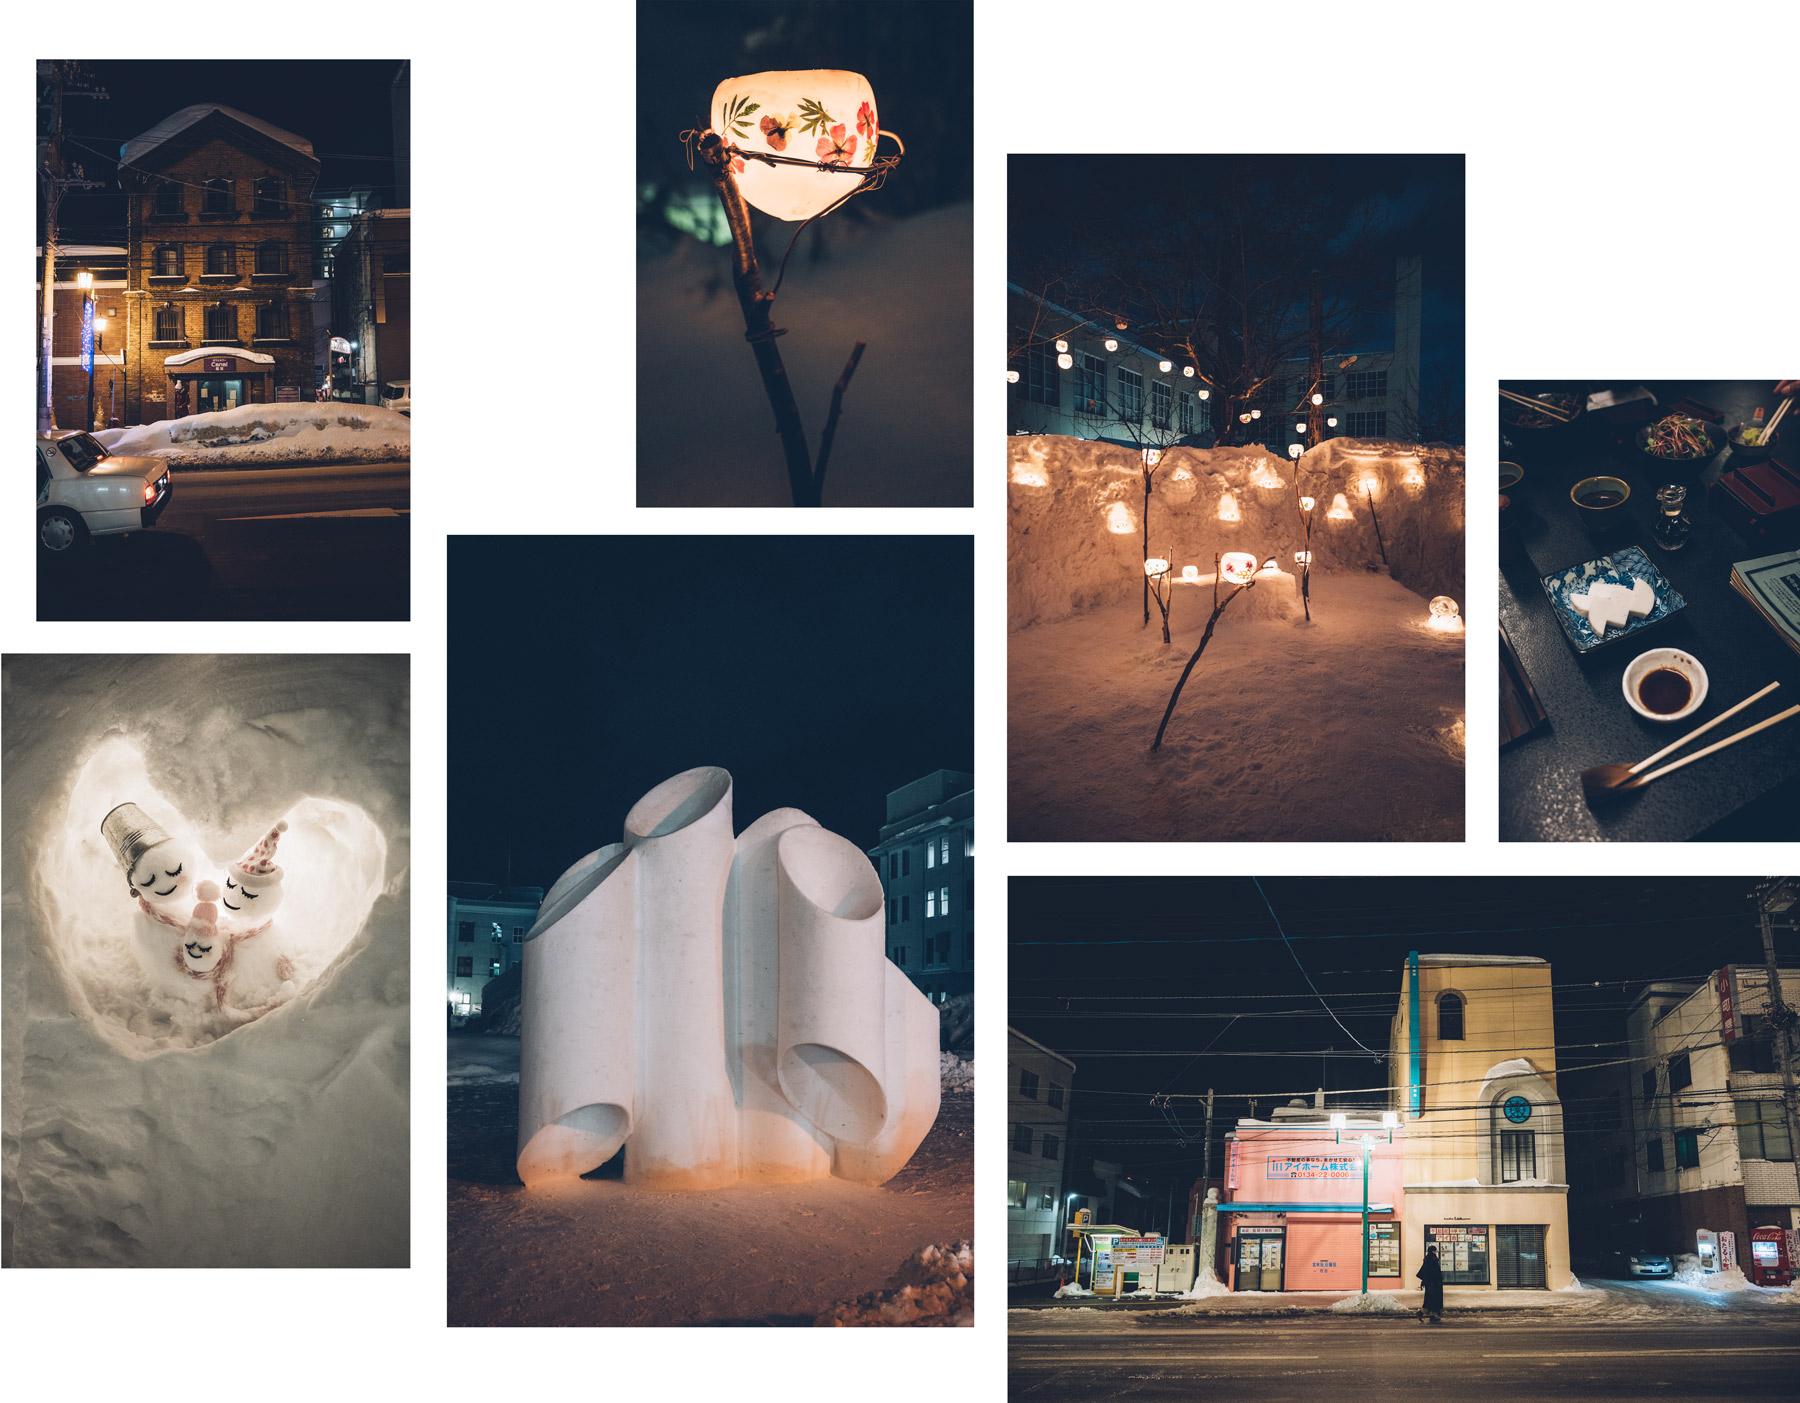 Otaru, light festival